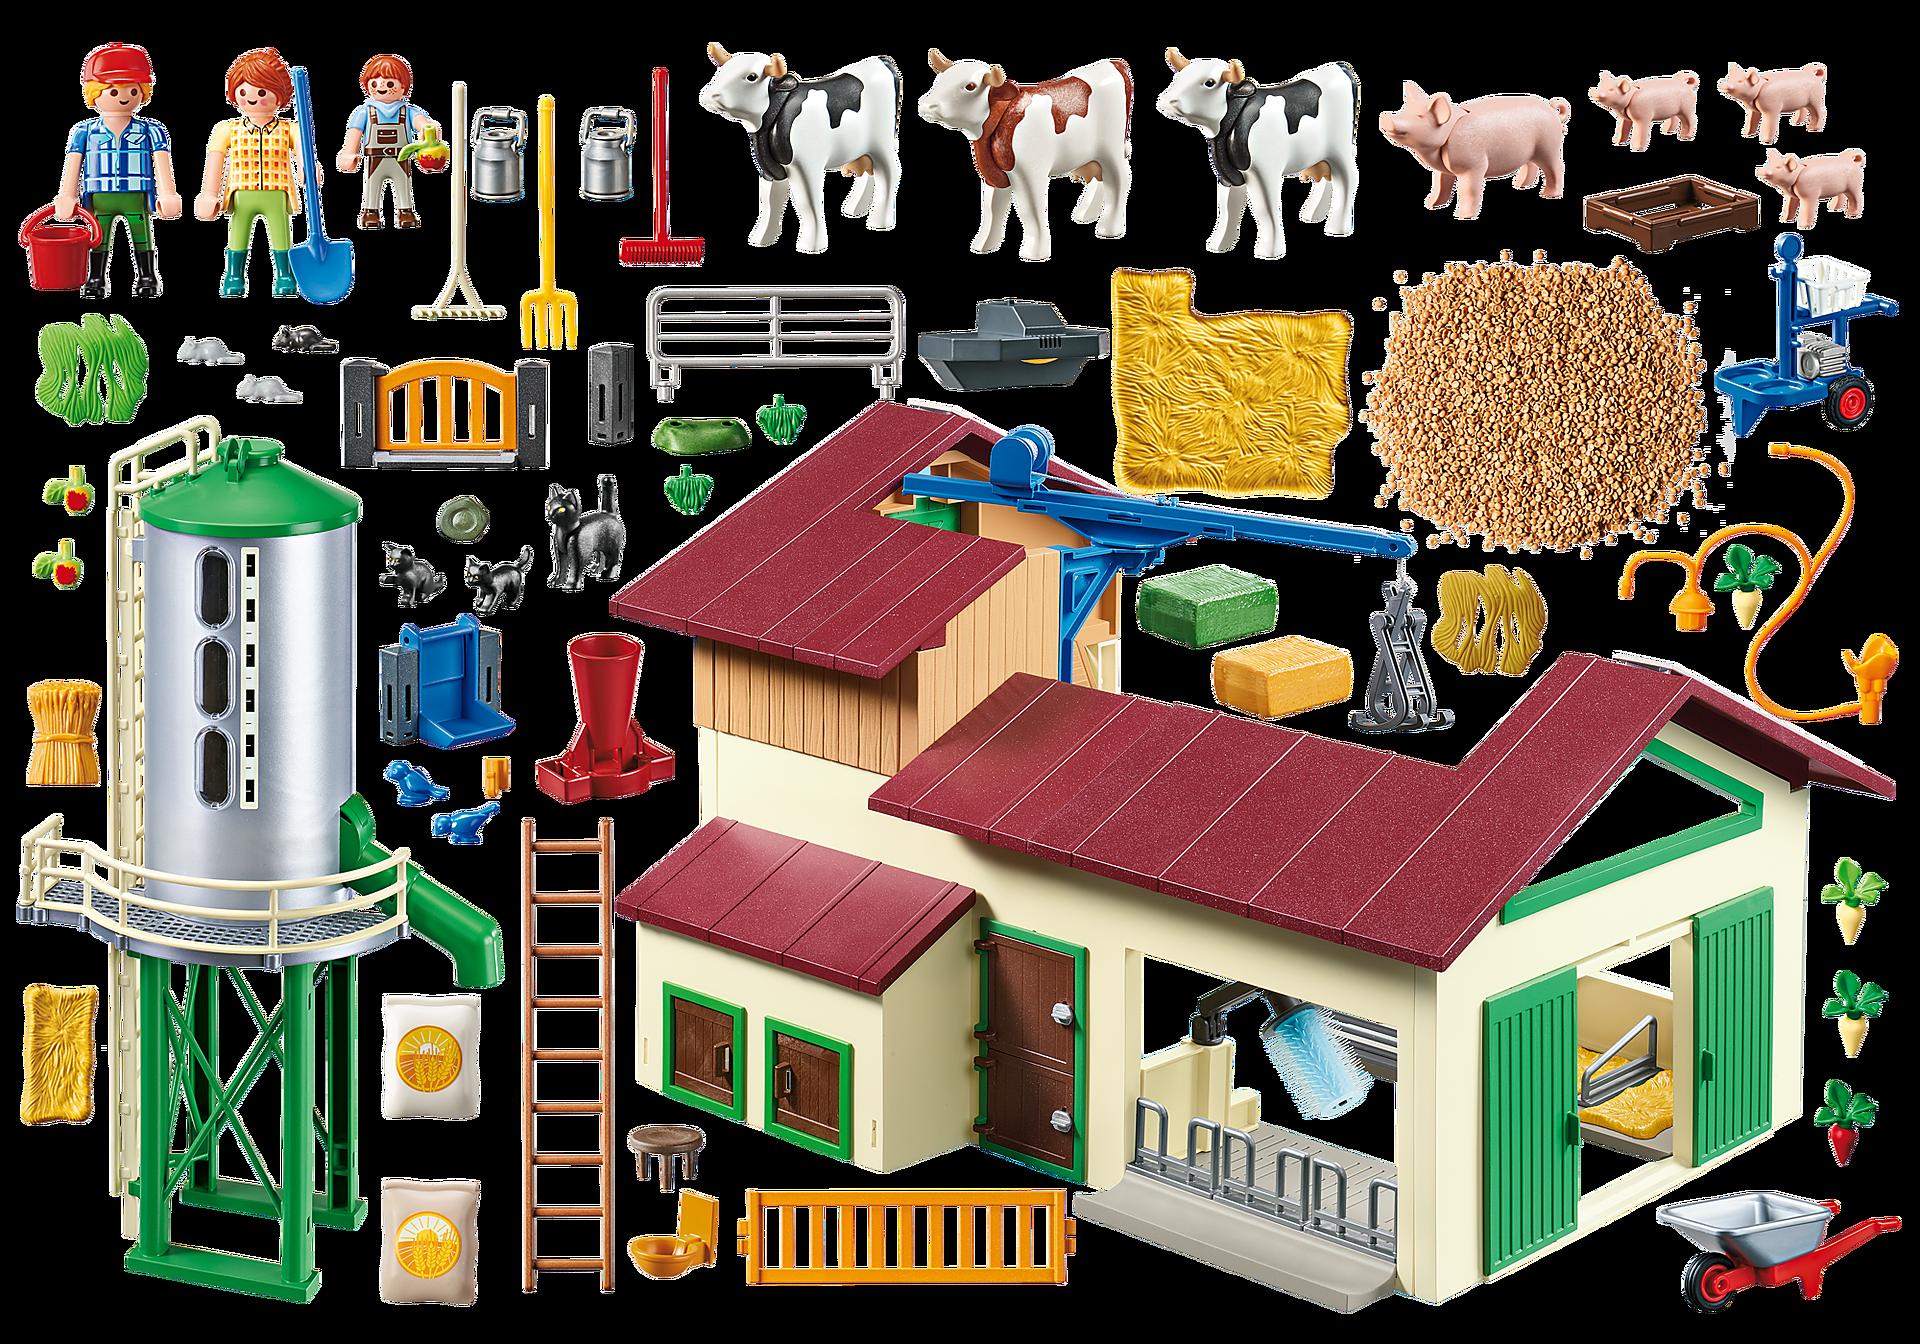 70132 Farm with Animals zoom image3